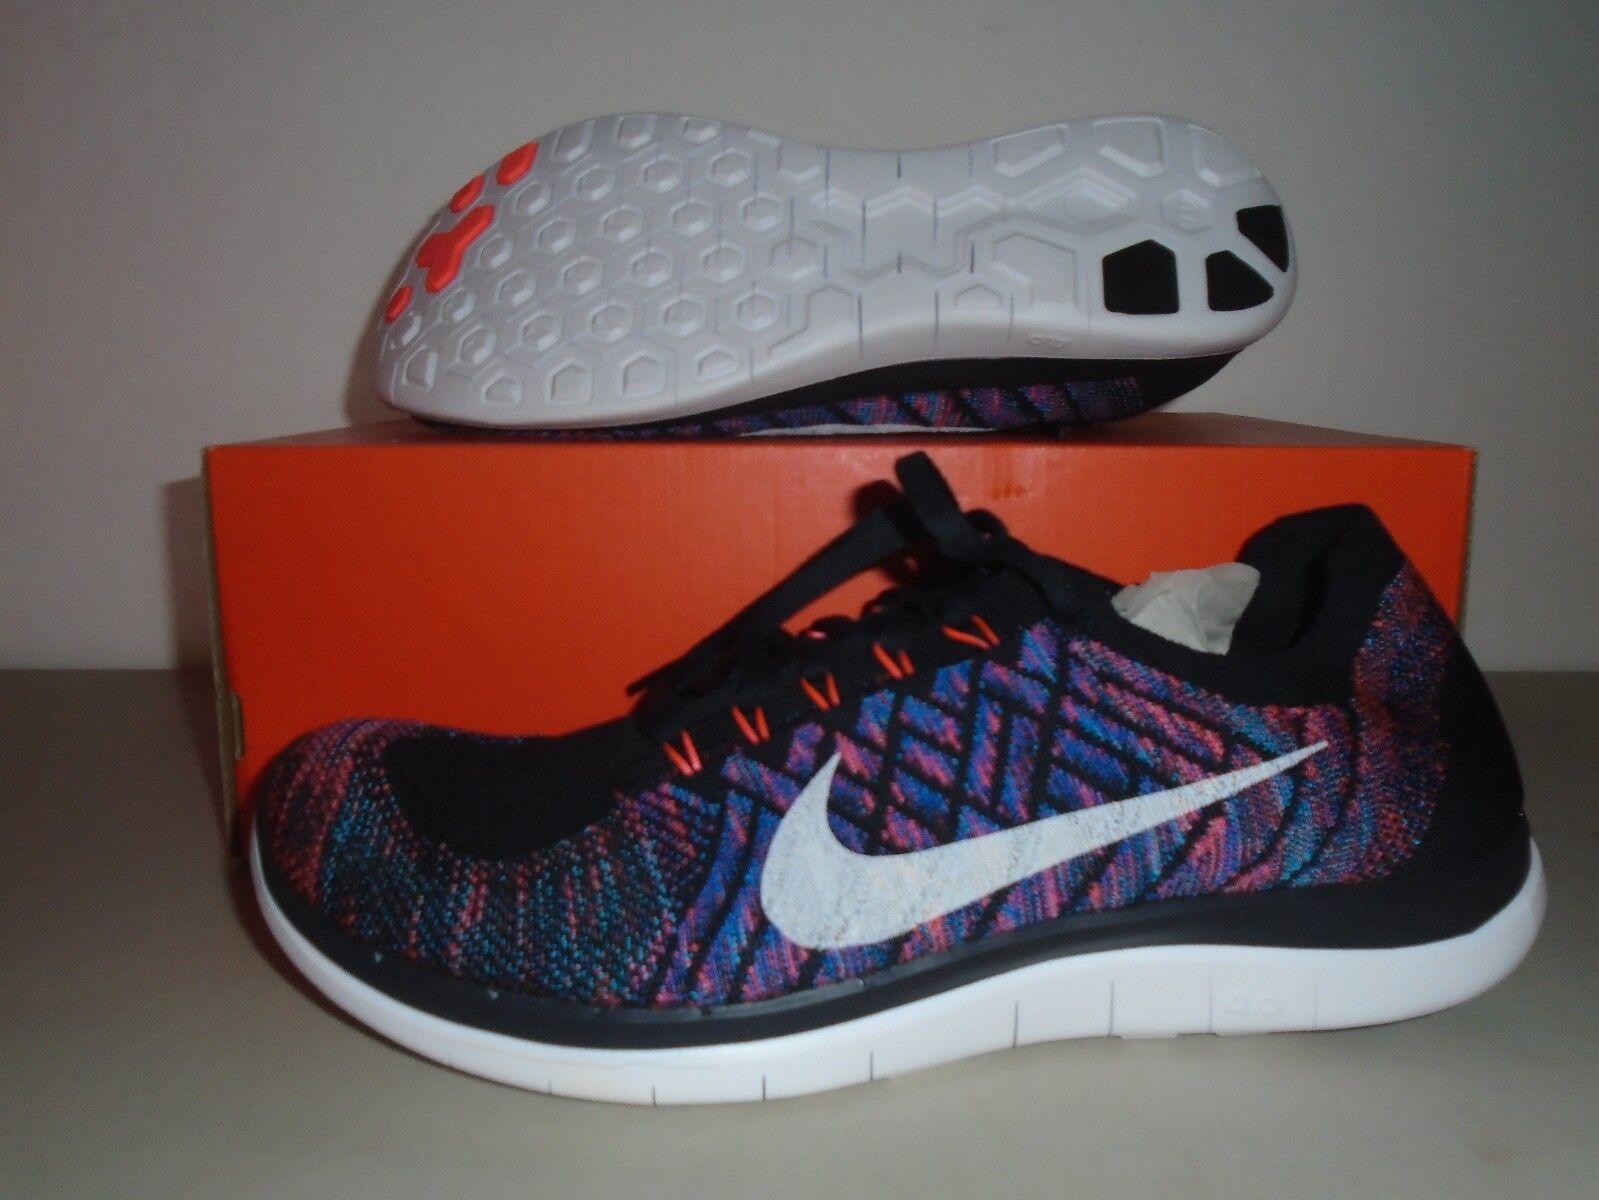 New Nike Free 4.0 Flyknit Dk Obsidian Hot Lava Running Shoes sz 10 durable  modeling ede96b5f8